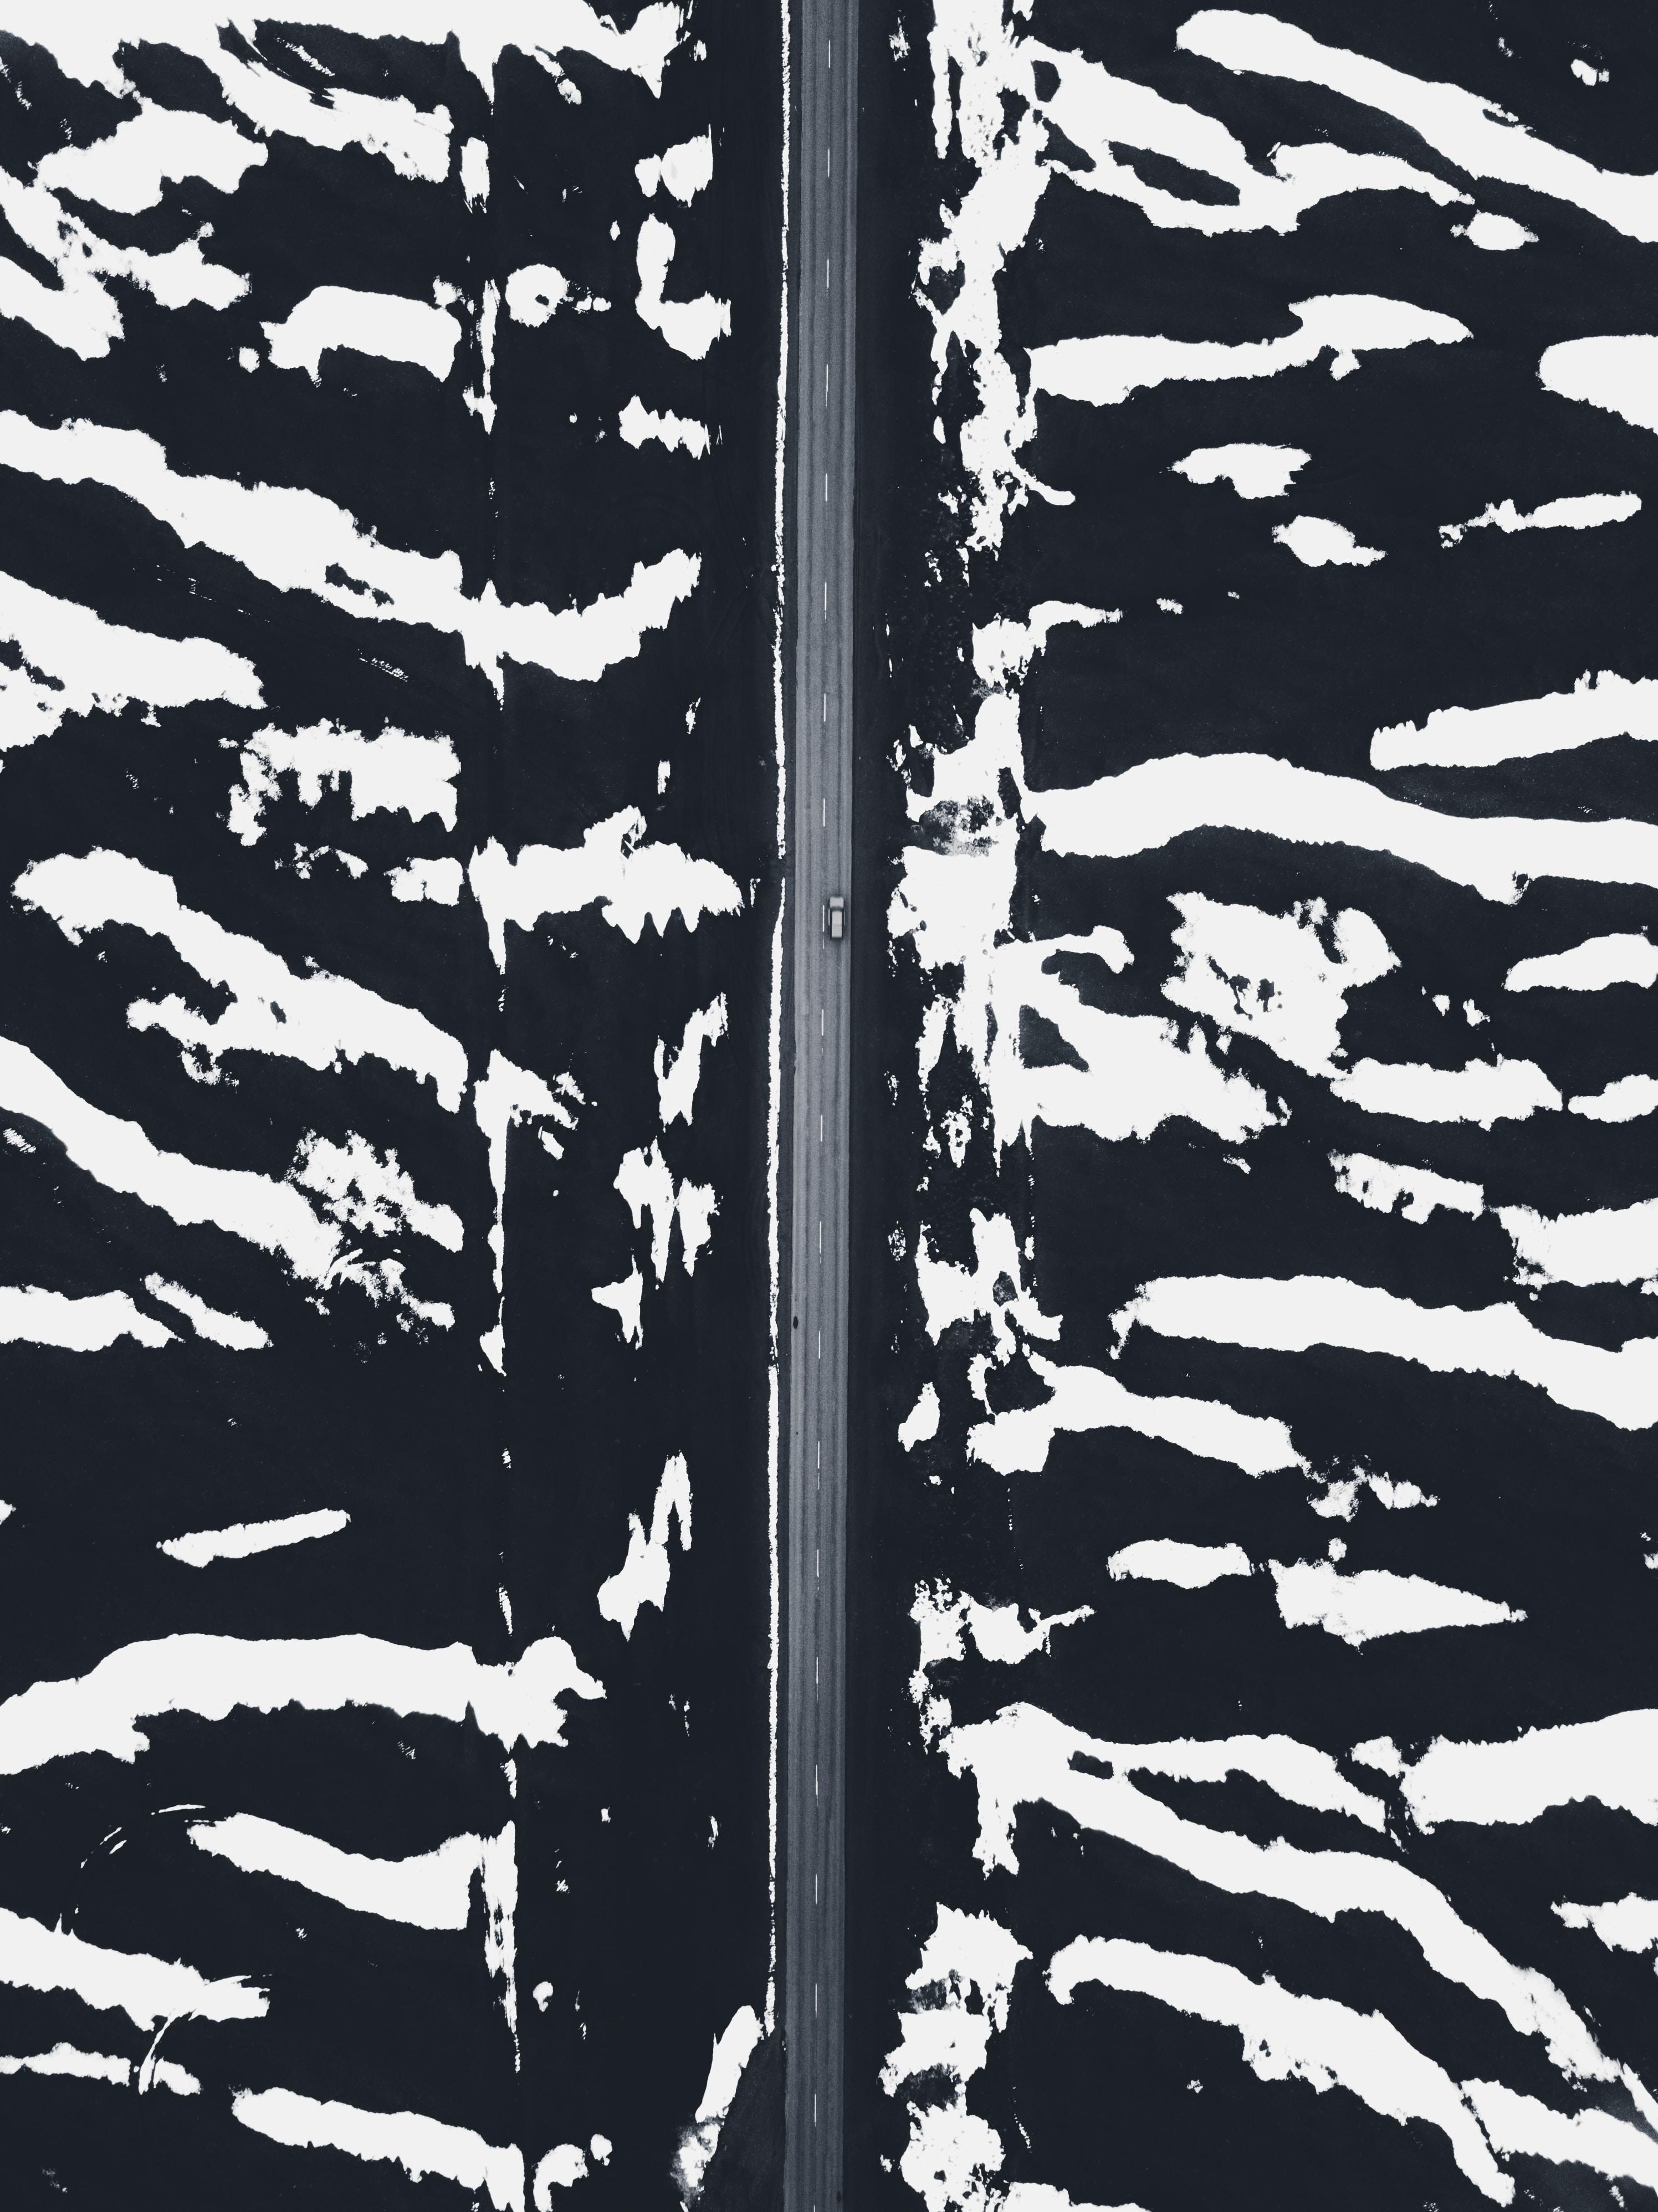 Unsplash placeholder image by Taneli Lahtinen